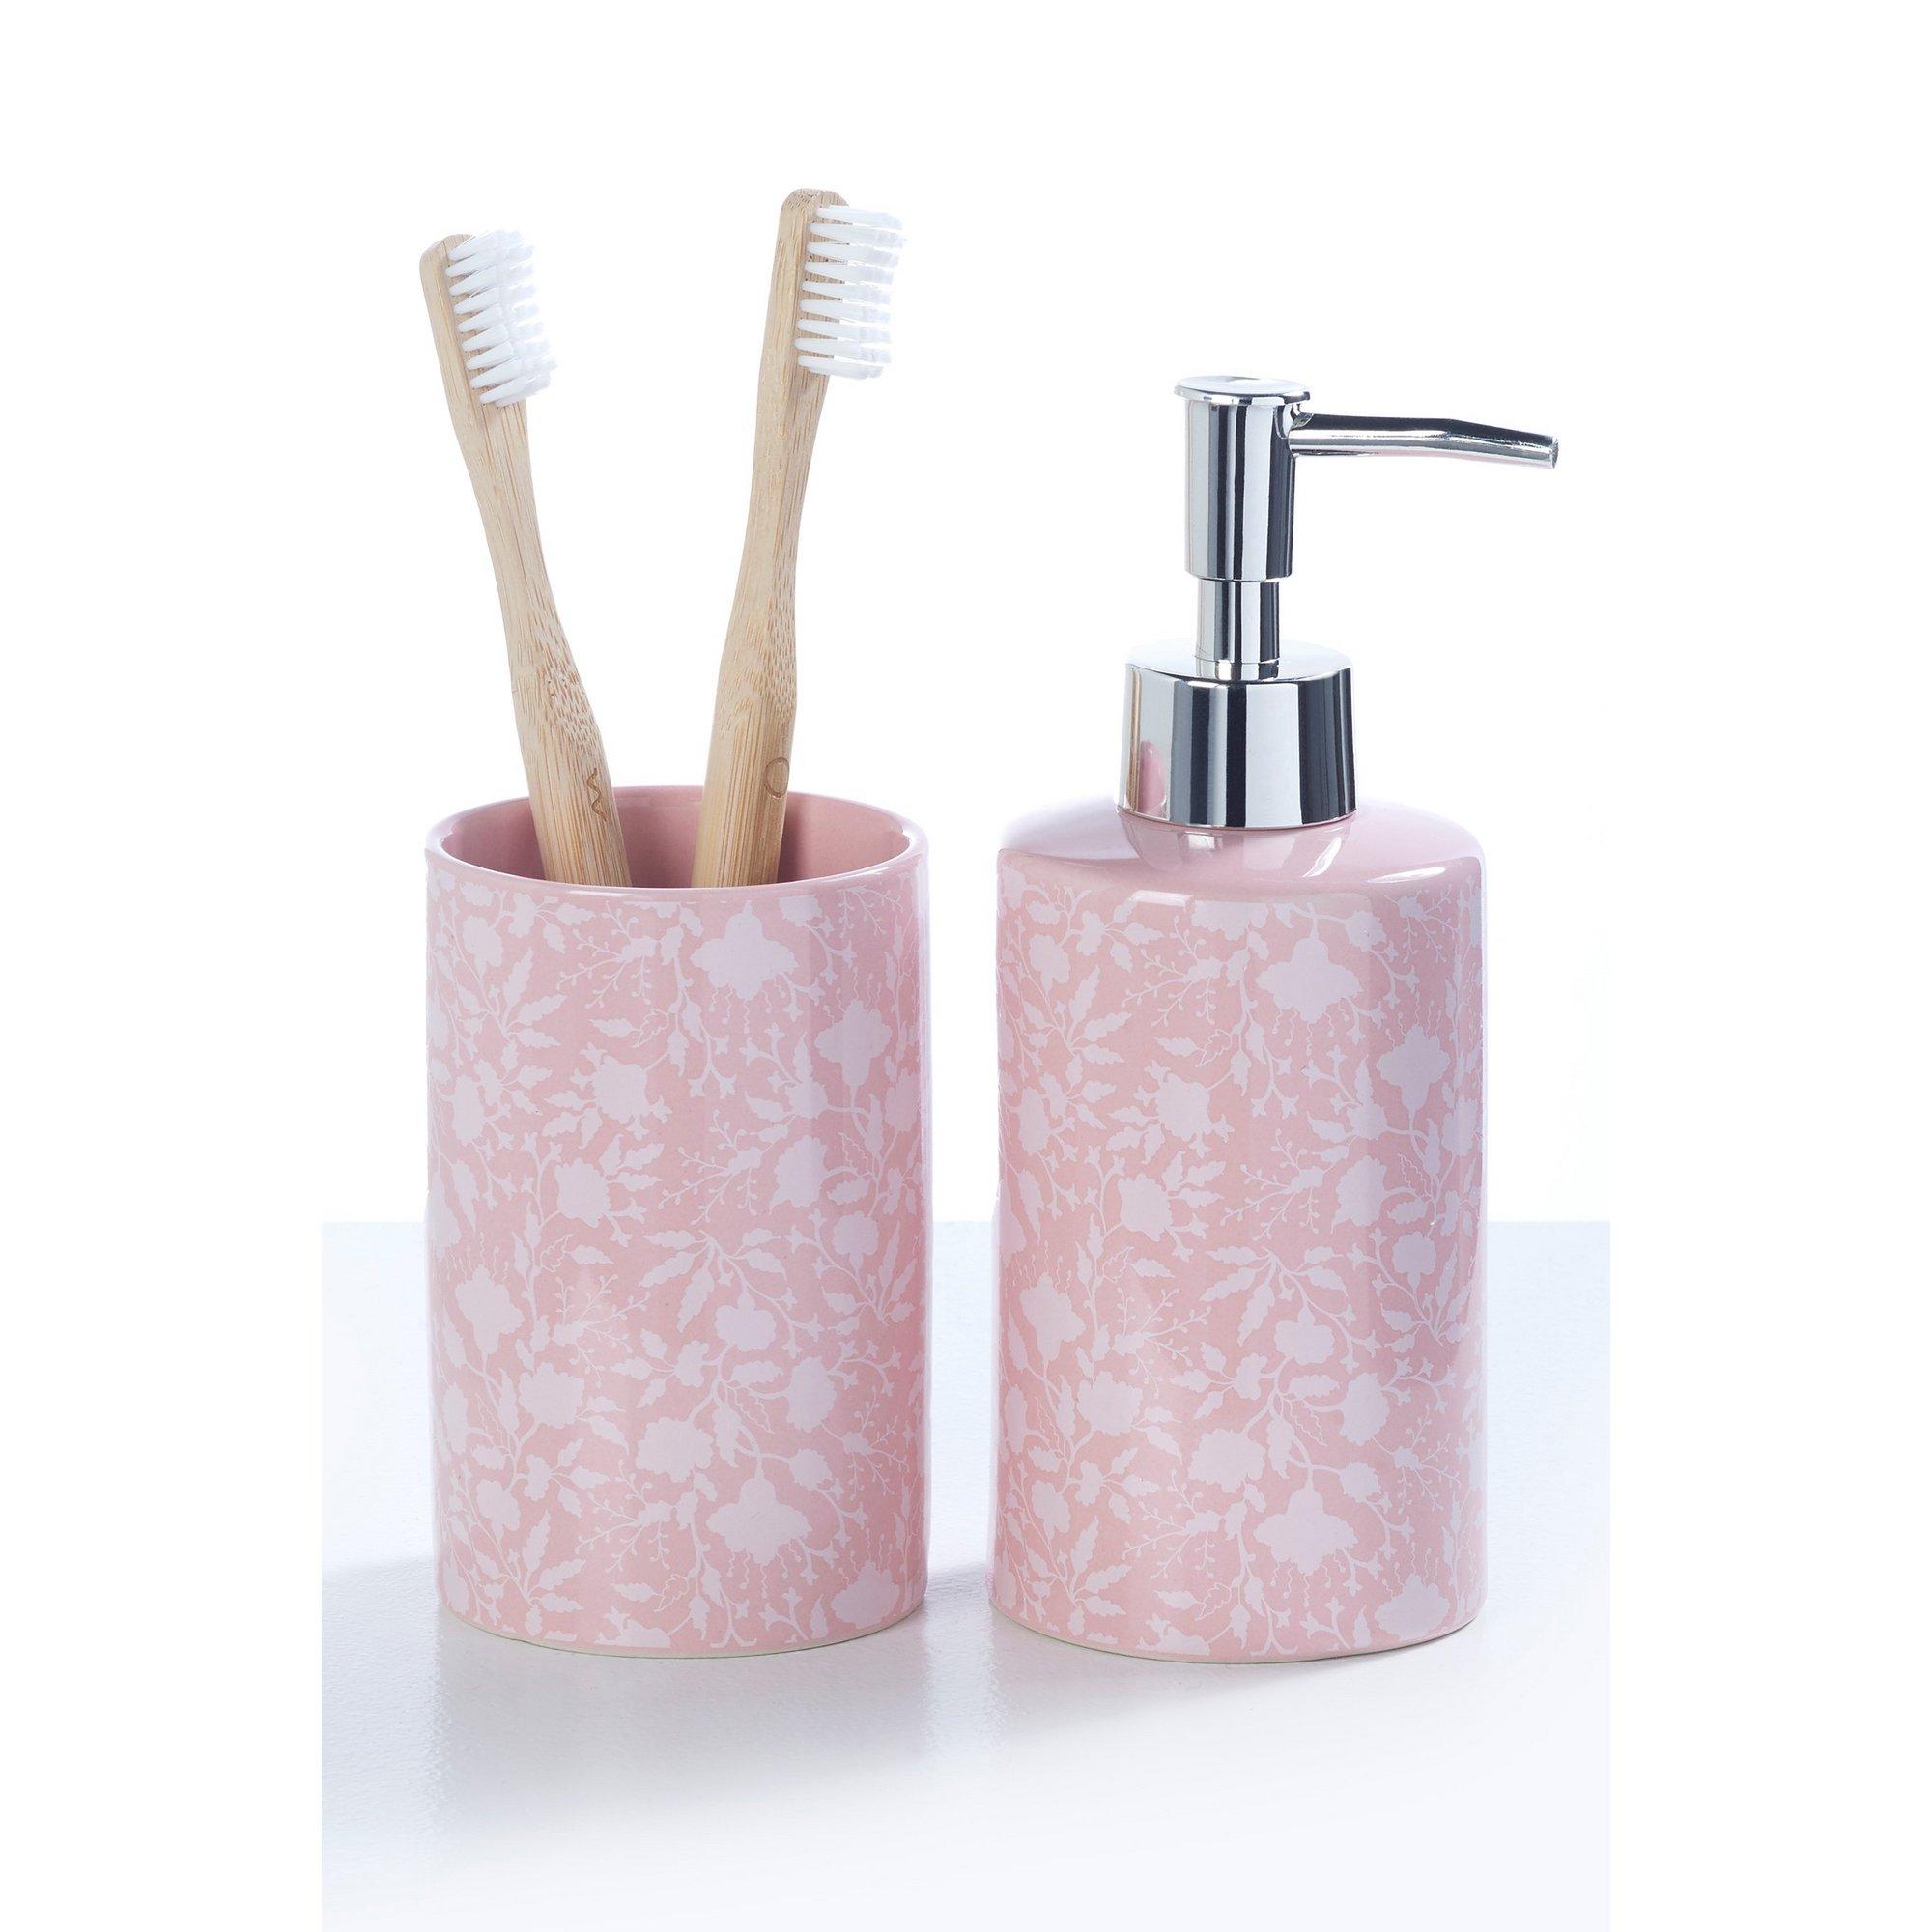 Image of 2-Piece Floral Ceramic Accessory Set